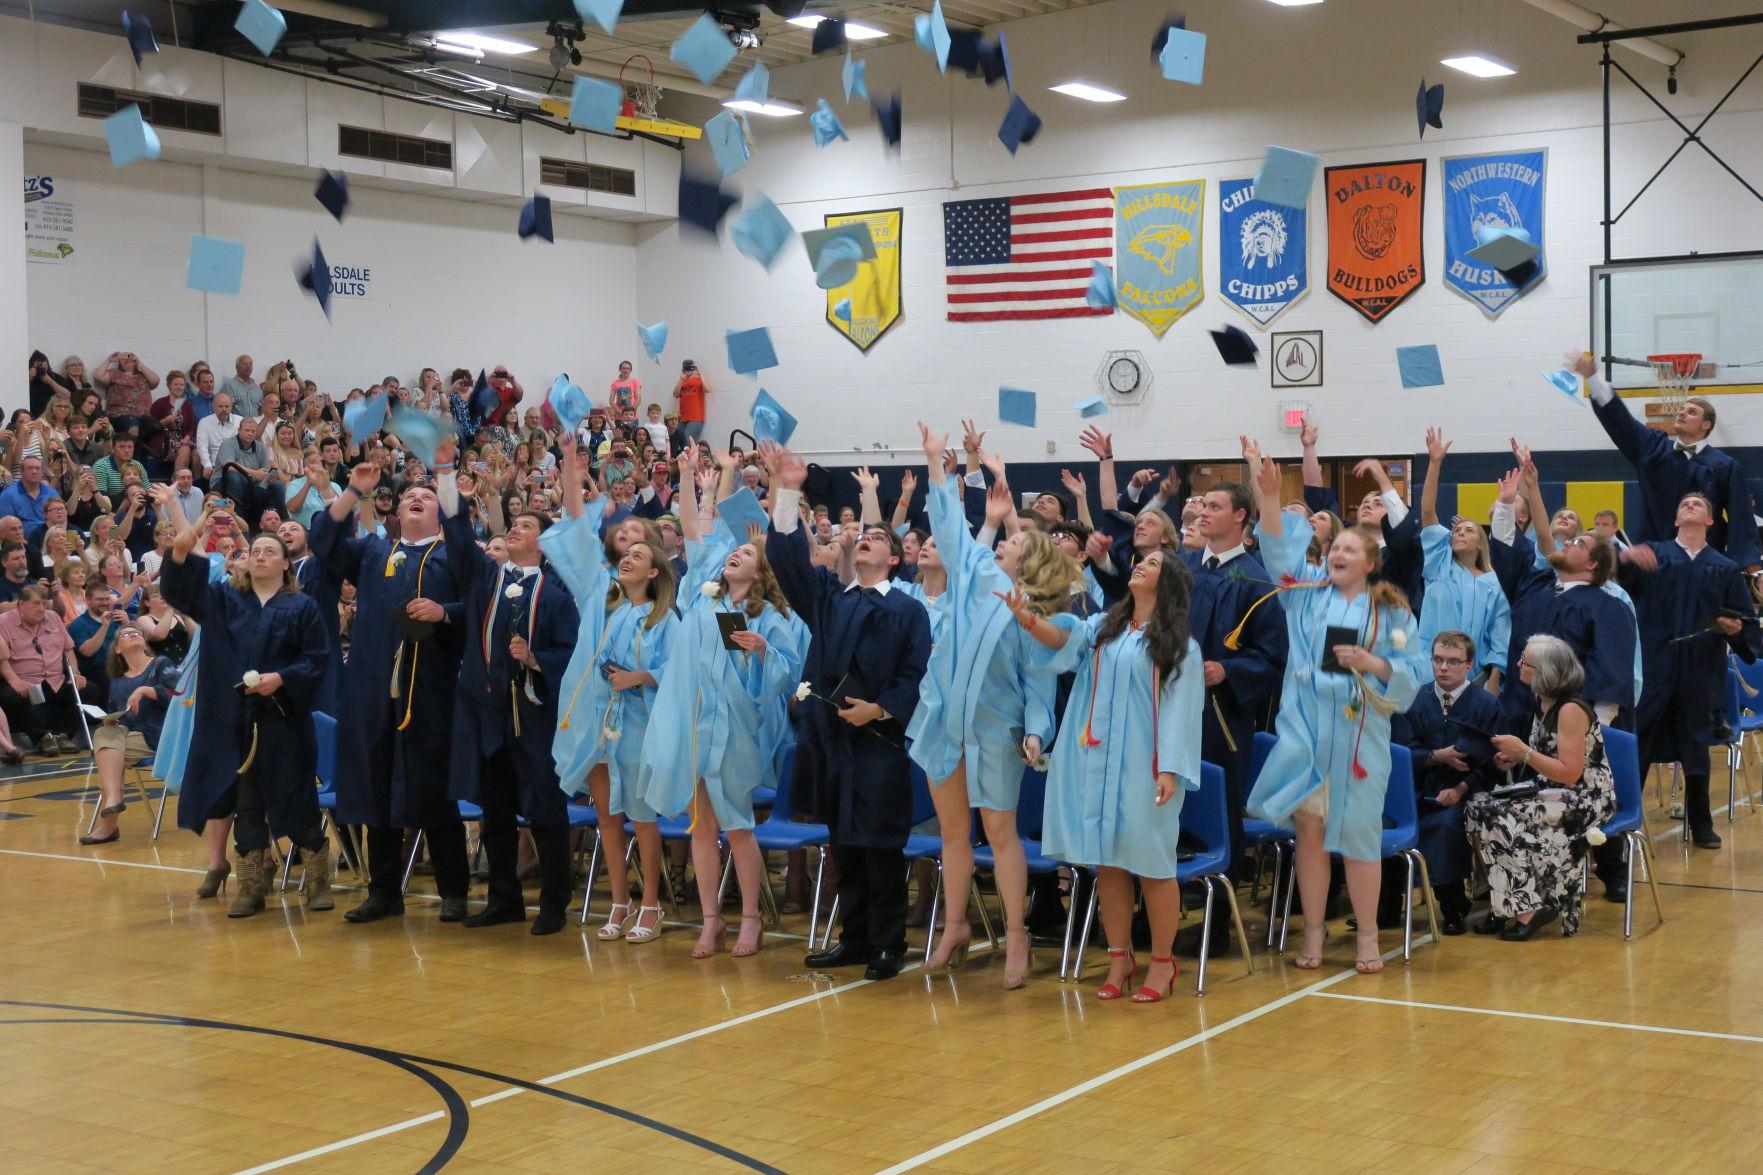 GALLERY: Hillsdale High School Graduation 2019